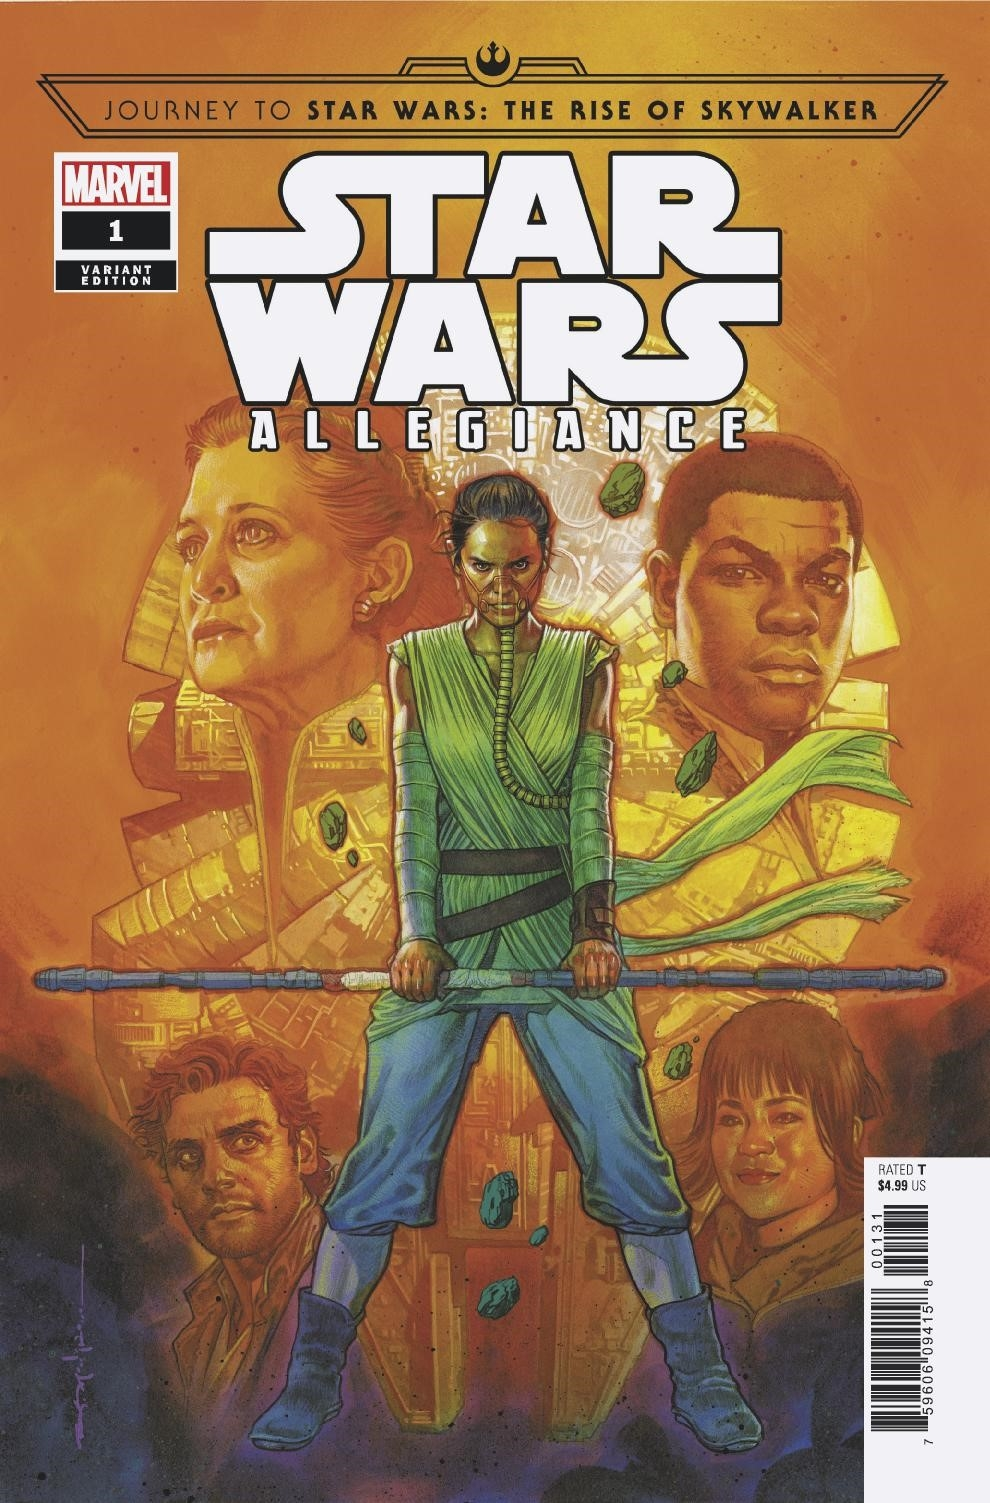 Allegiance #1 (Brian Stelfreeze Variant Cover) (09.10.2019)